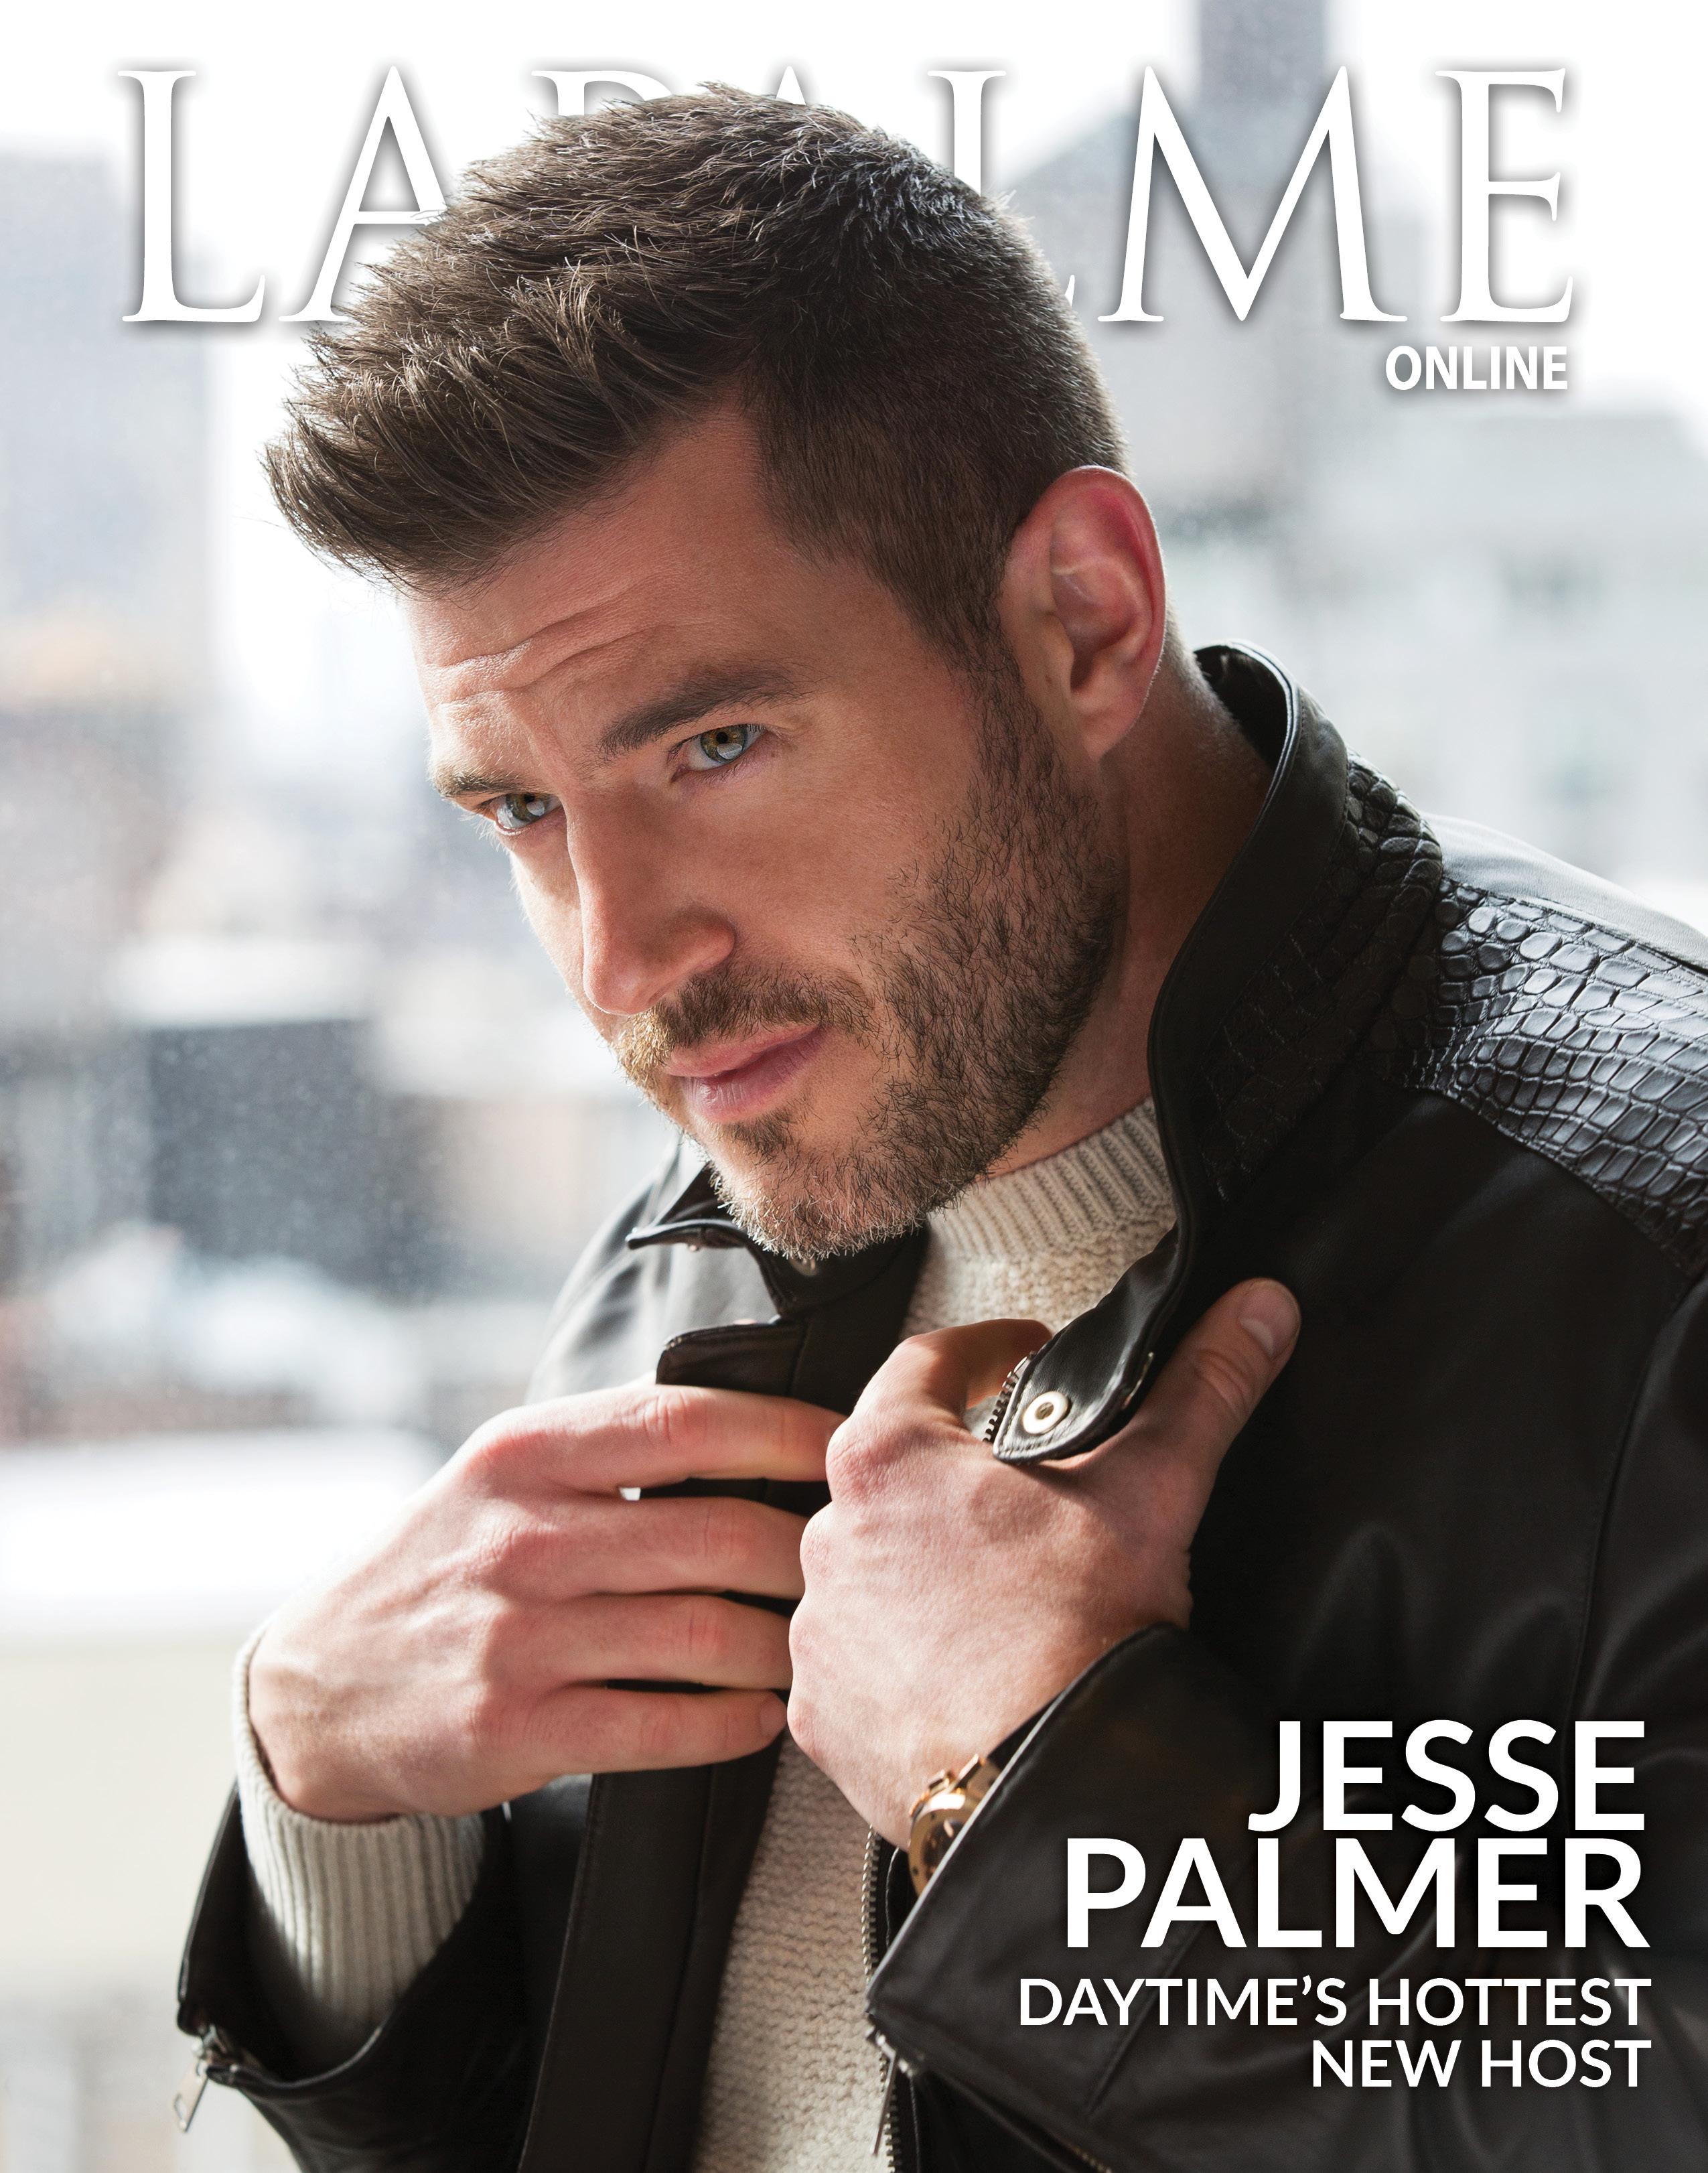 Jesse Palmer: Hottest New Host